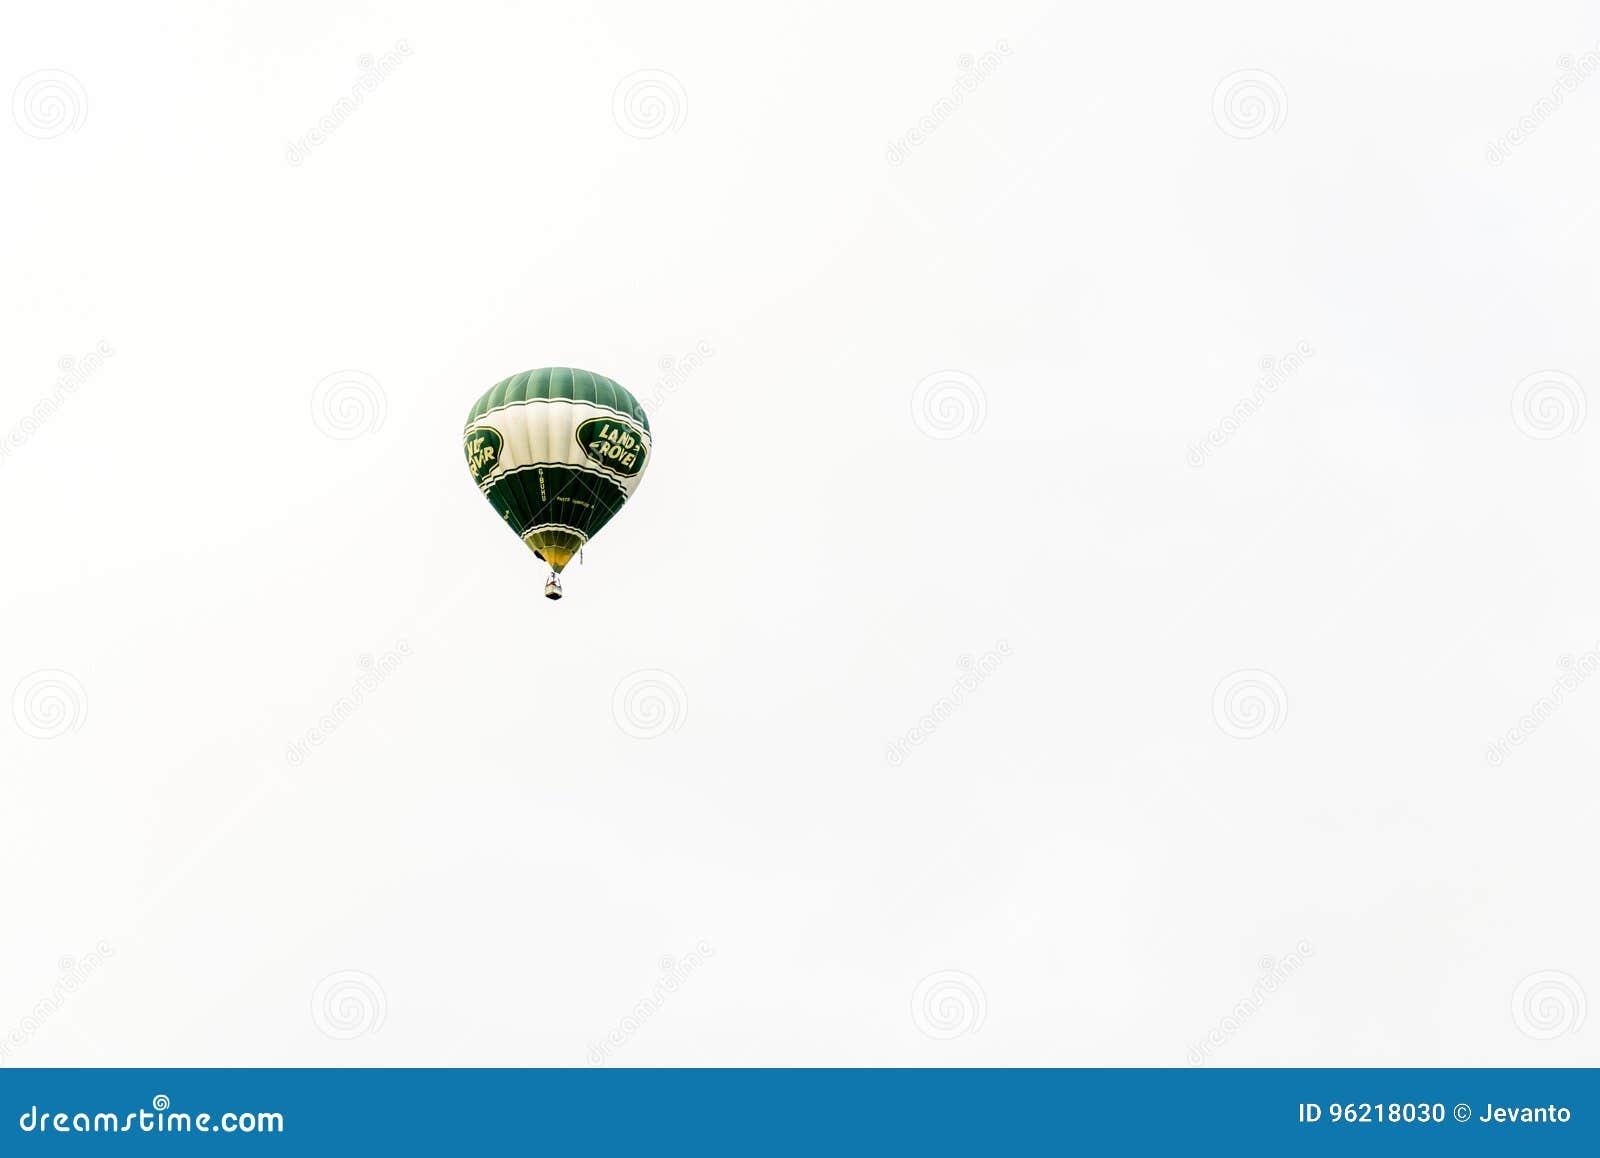 Racecourse, Νόρθαμπτον, Αγγλία, UK - 1 Ιουλίου: Μπαλόνι ζεστού αέρα με το λογότυπο του Land Rover που πετά πέρα από την πόλη του